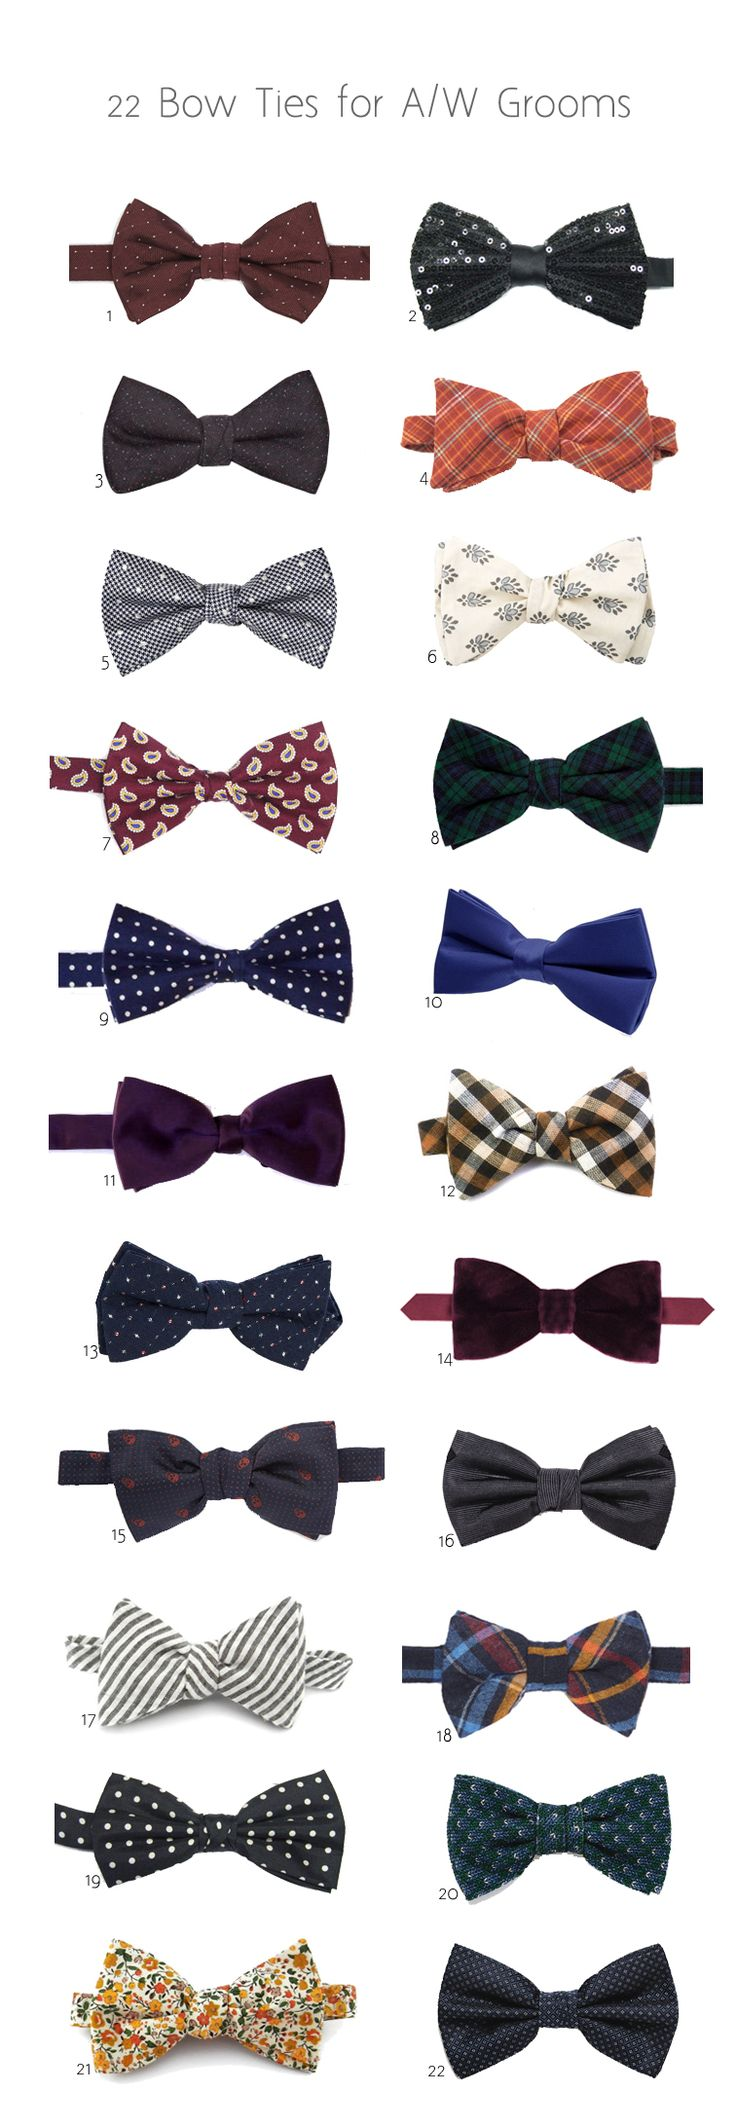 22 of the Best Bow Ties for Autumn/Winter Grooms | WeddingsOnline